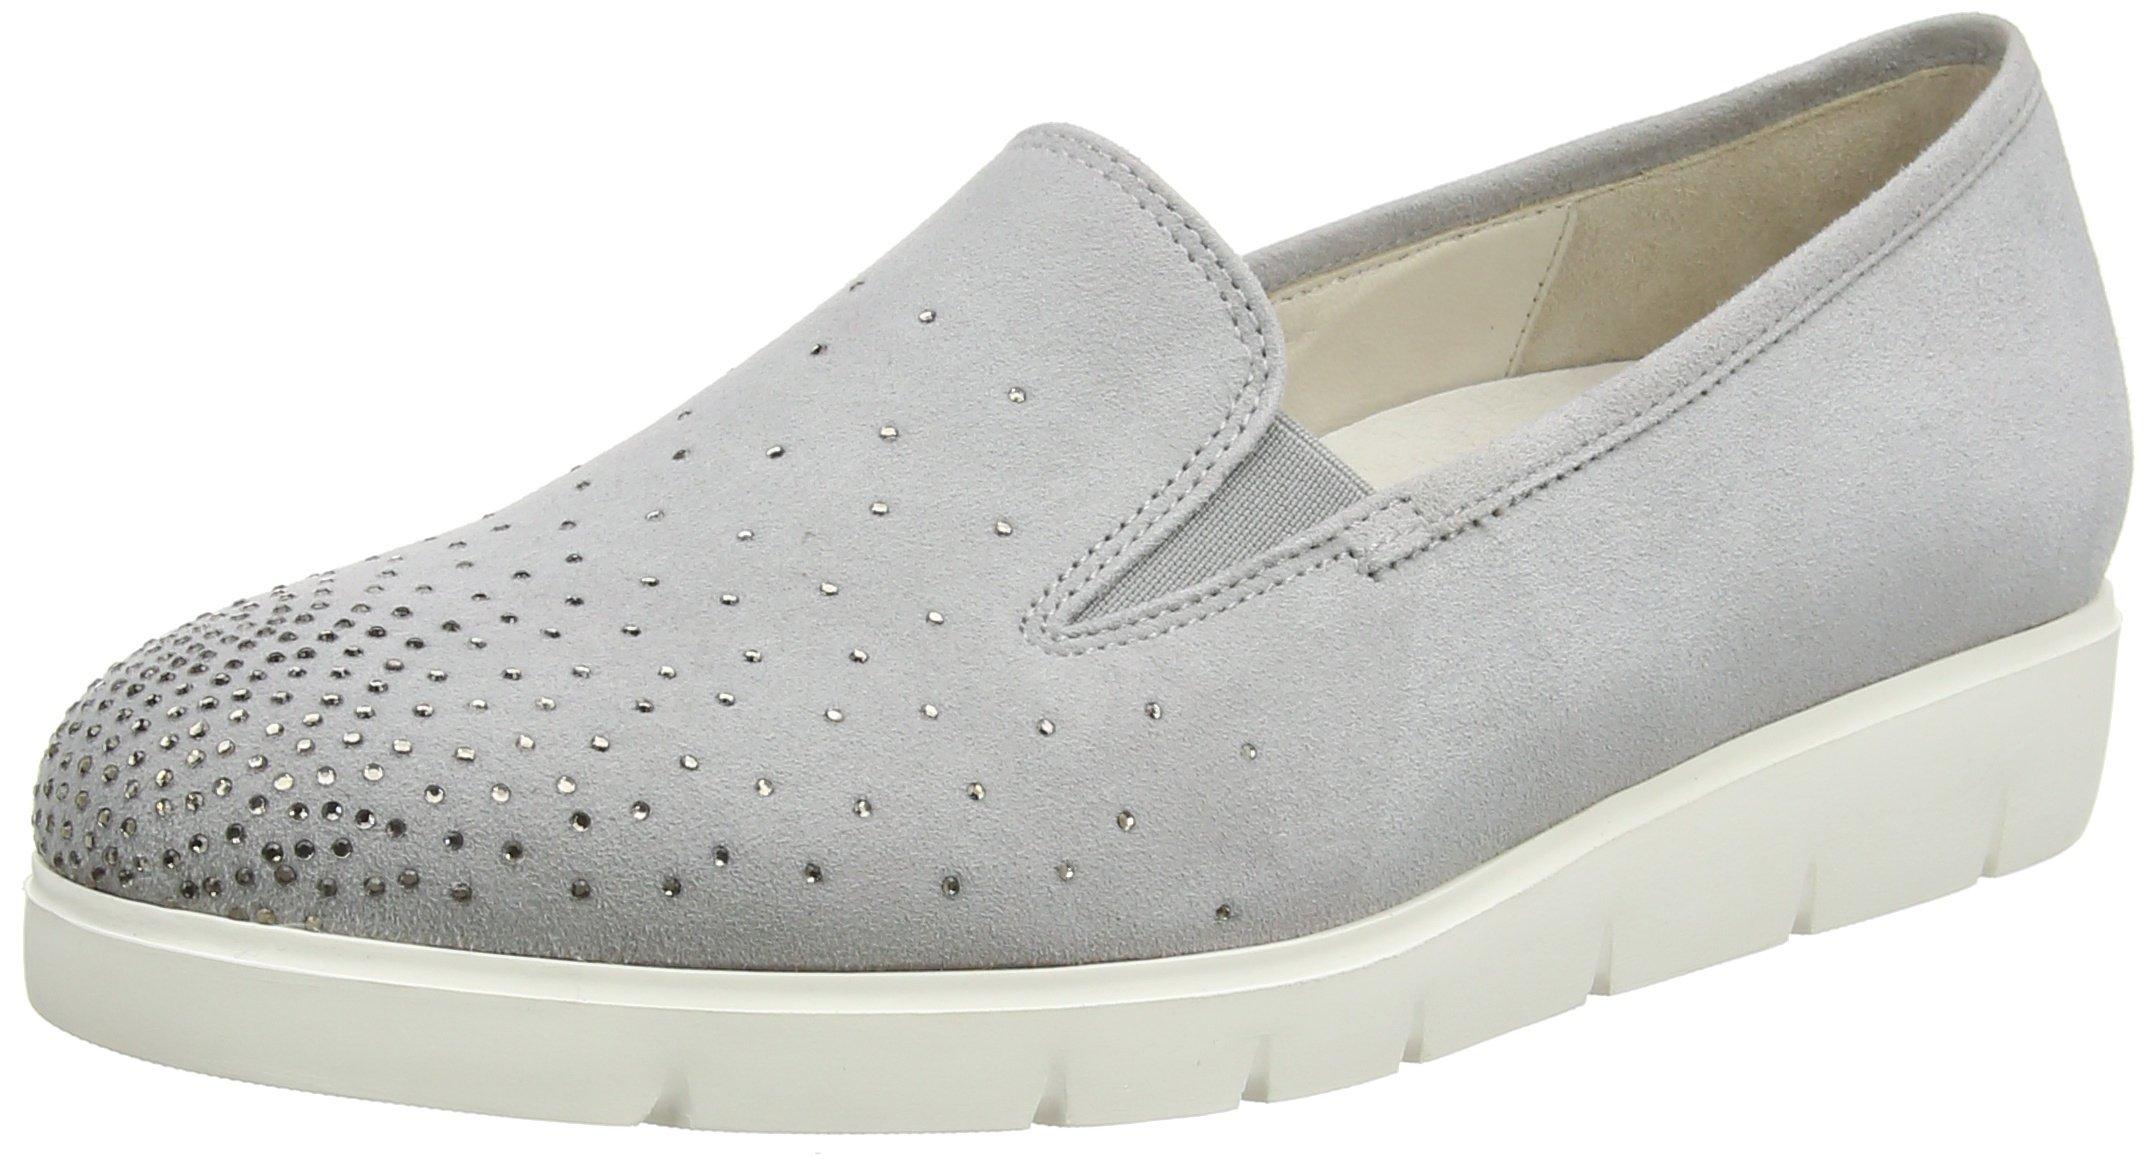 Greystrass40 5 Eu Gabor ComfortBallerines FemmeGrislight Shoes OPkZiwTuX